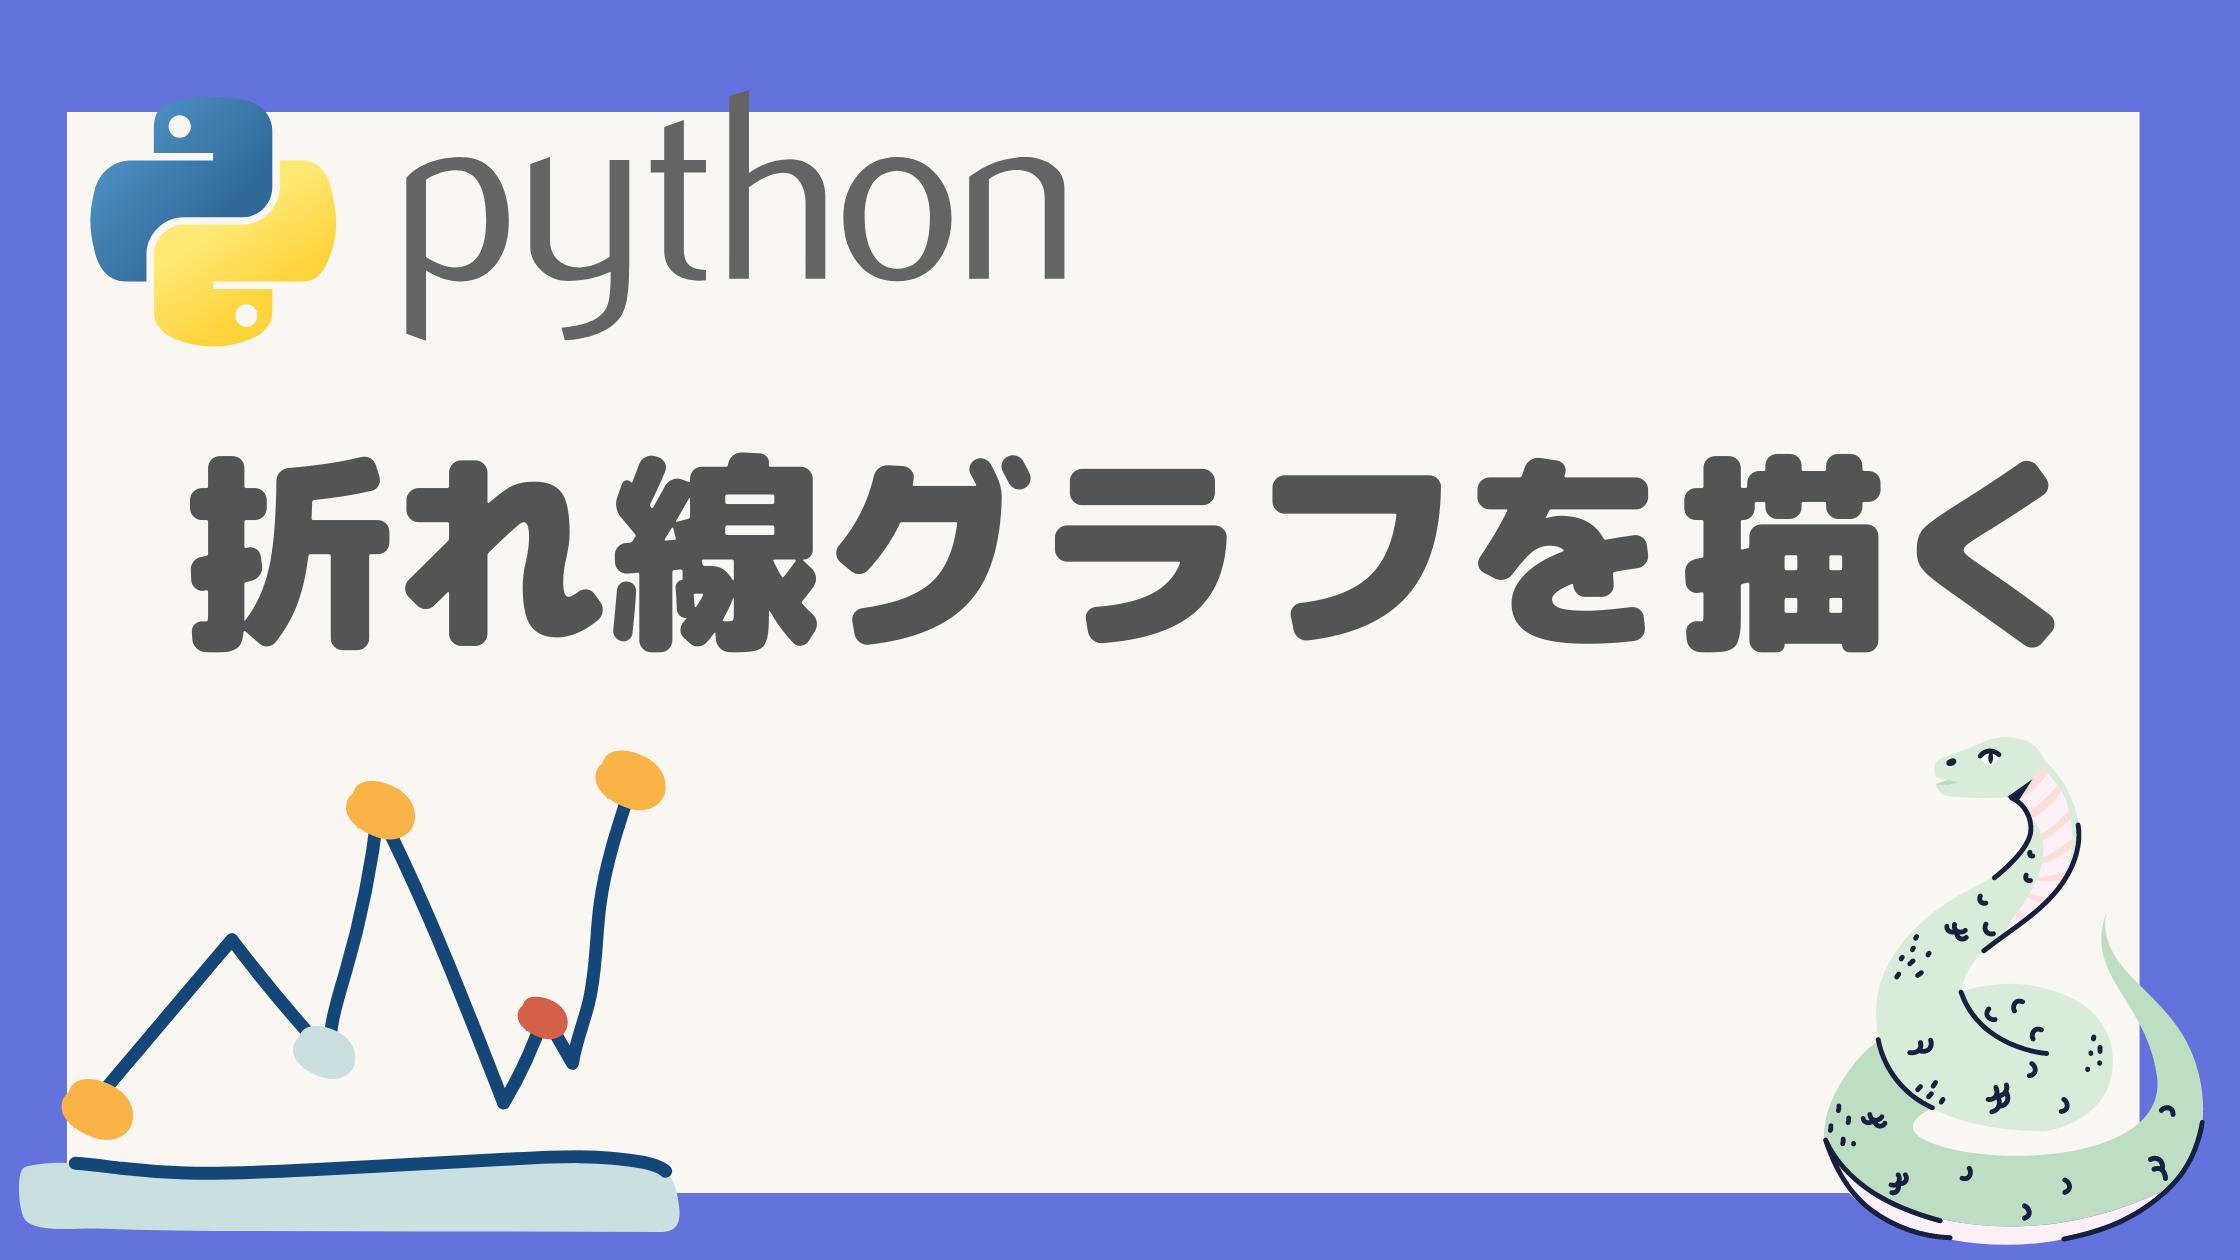 pythonの折れ線グラフの記事のアイキャッチ